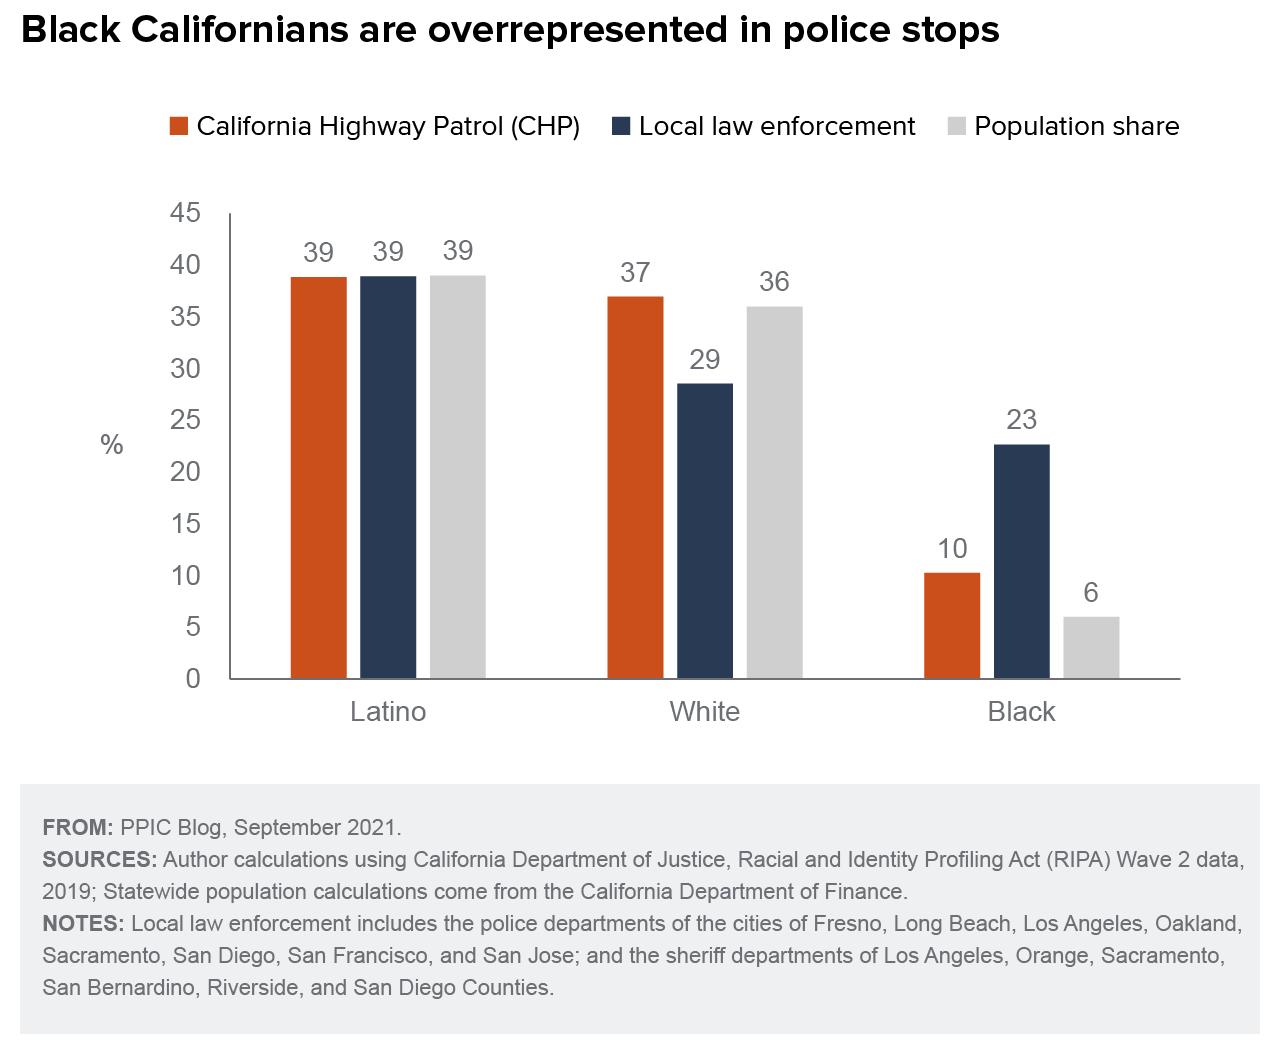 figure - Black Californians Are Overrepresented in Police Stops